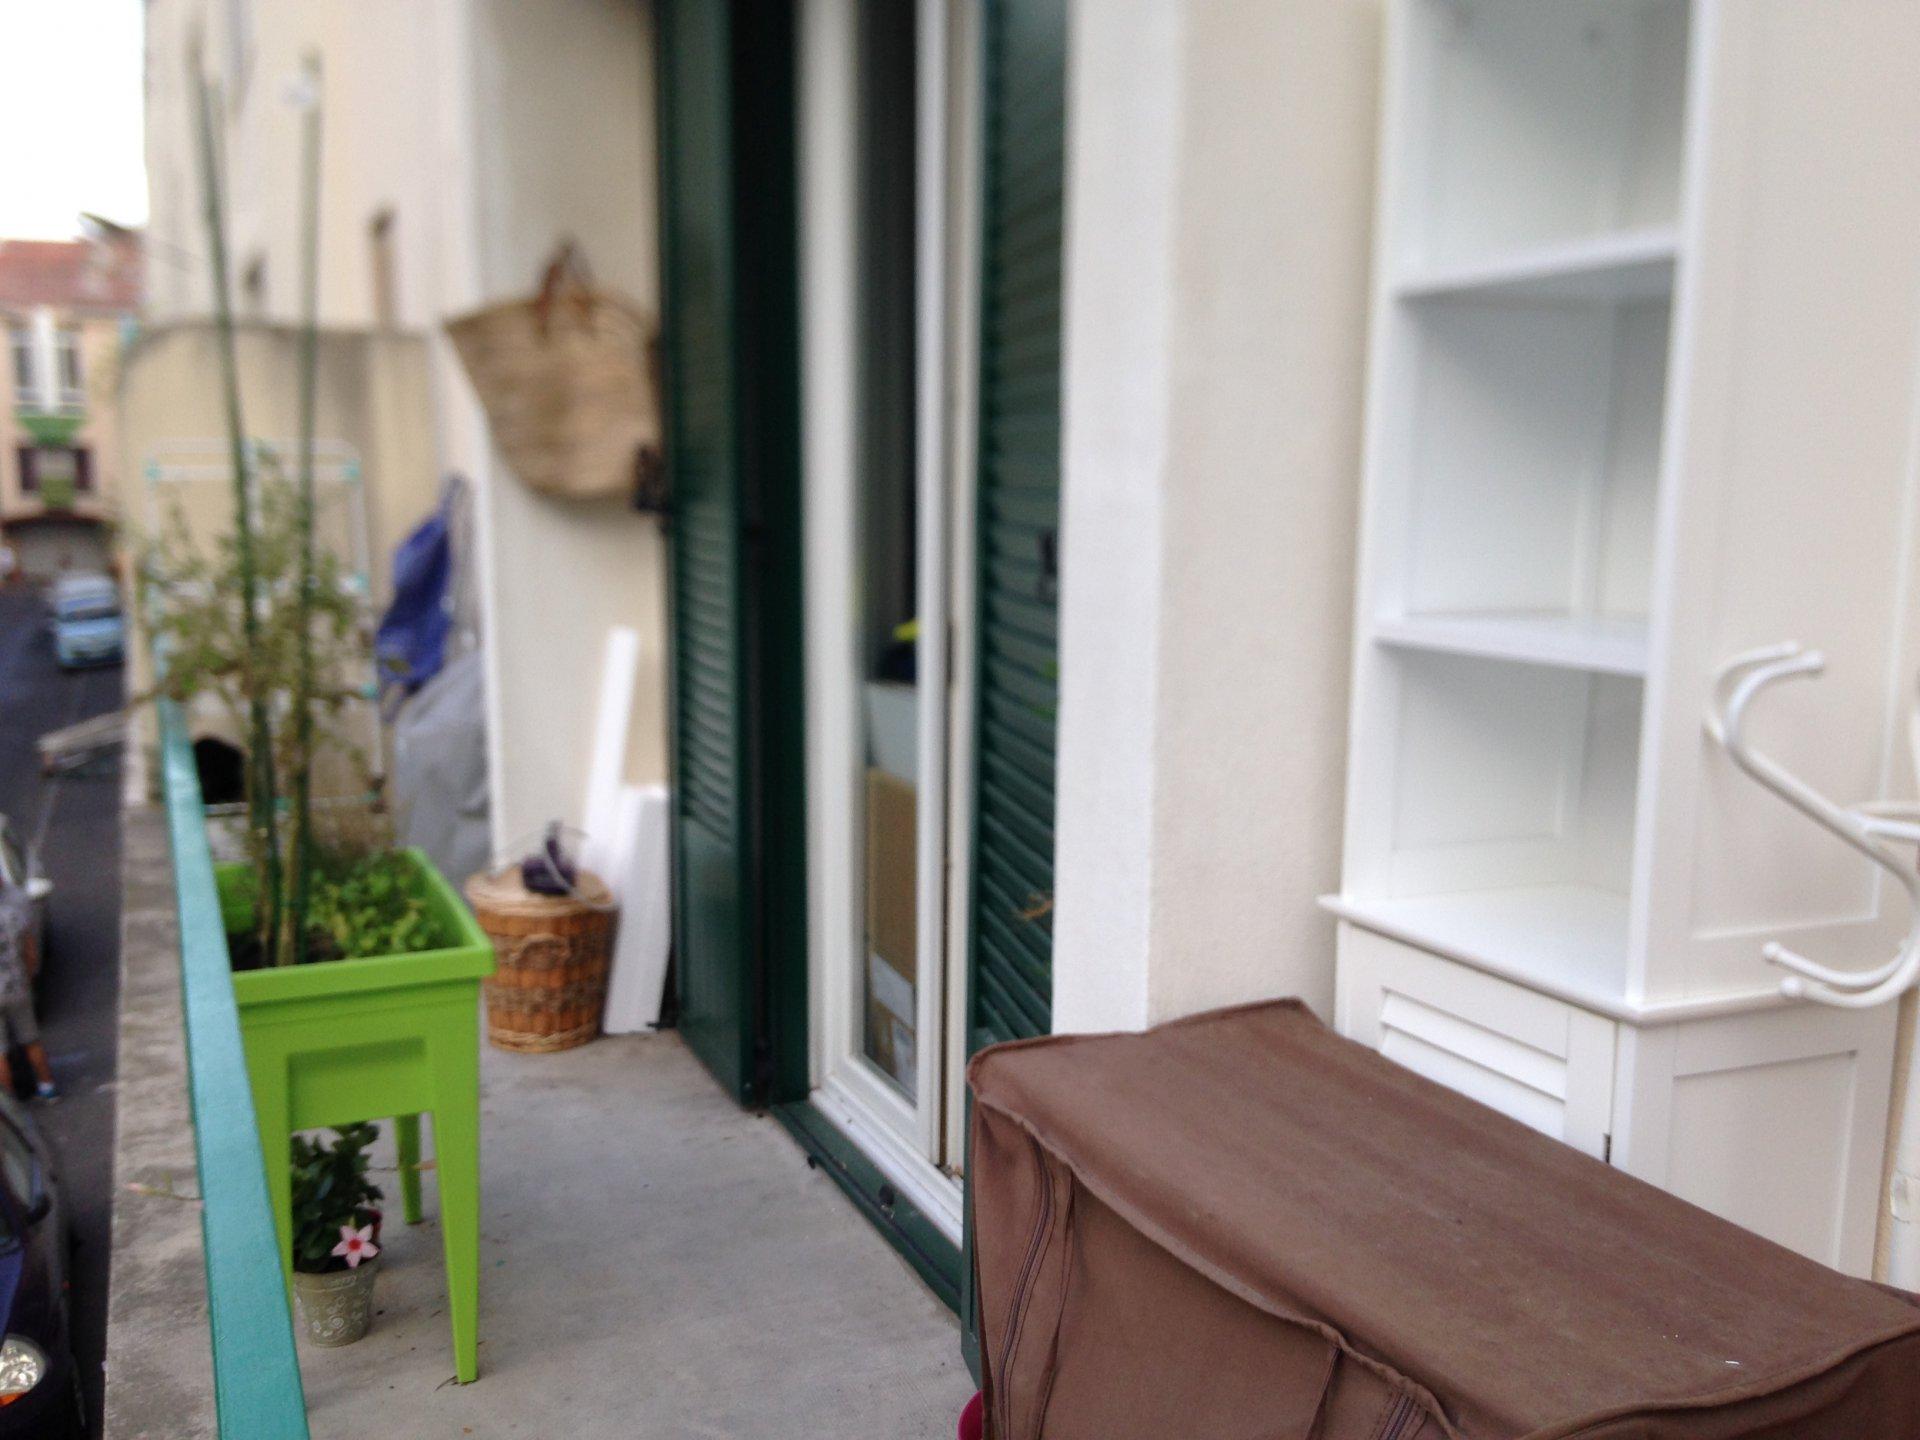 Appartement type 4, 62m², trois chambres, balcon